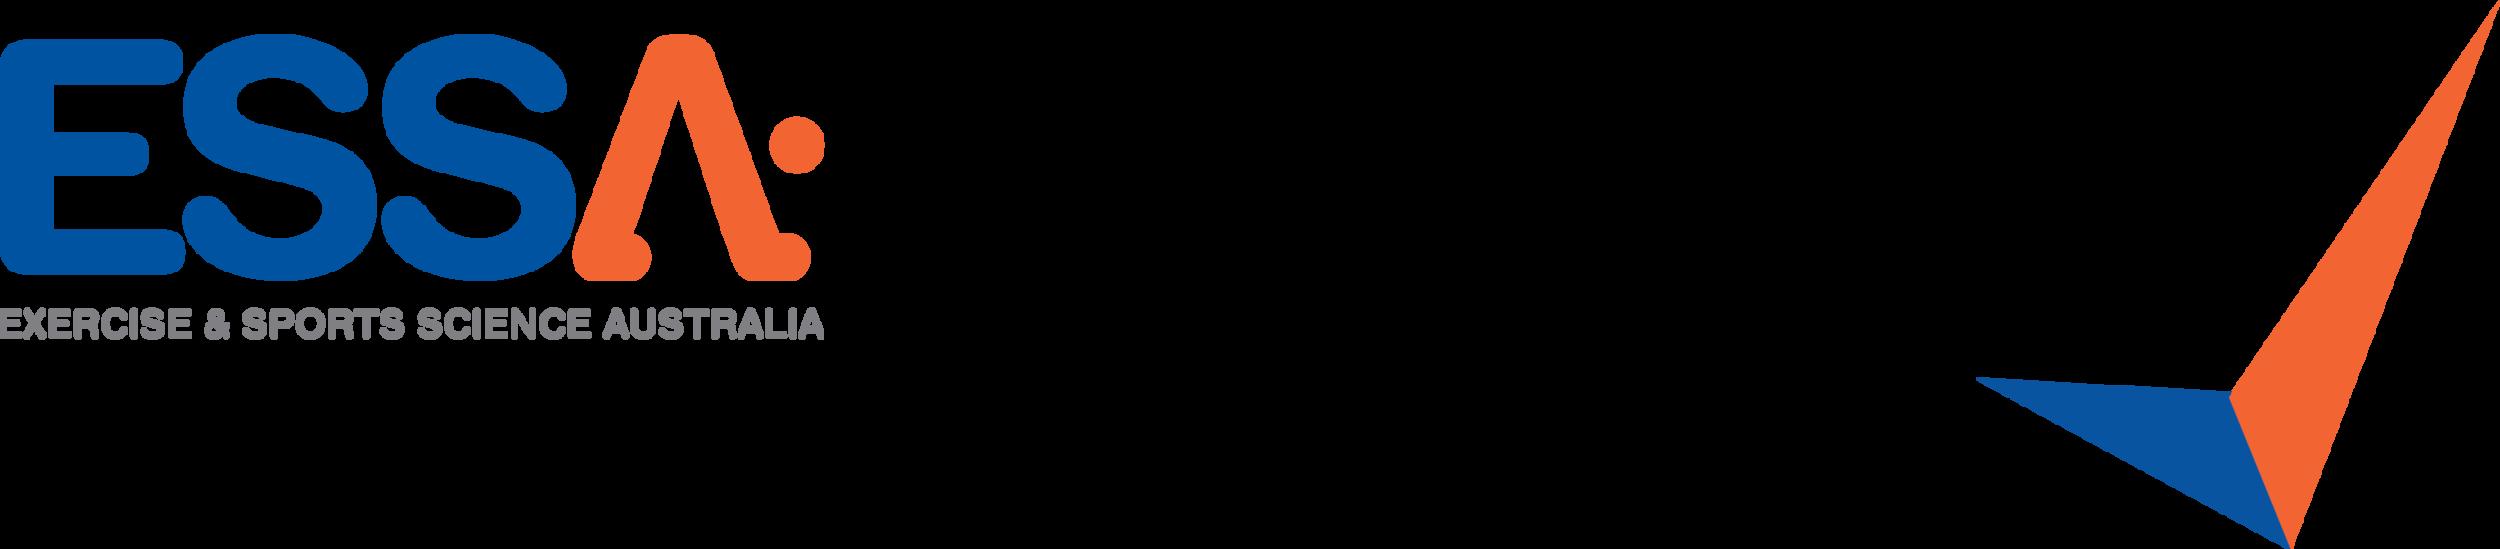 ESSA Accredited PD logo_colour_landscape.png